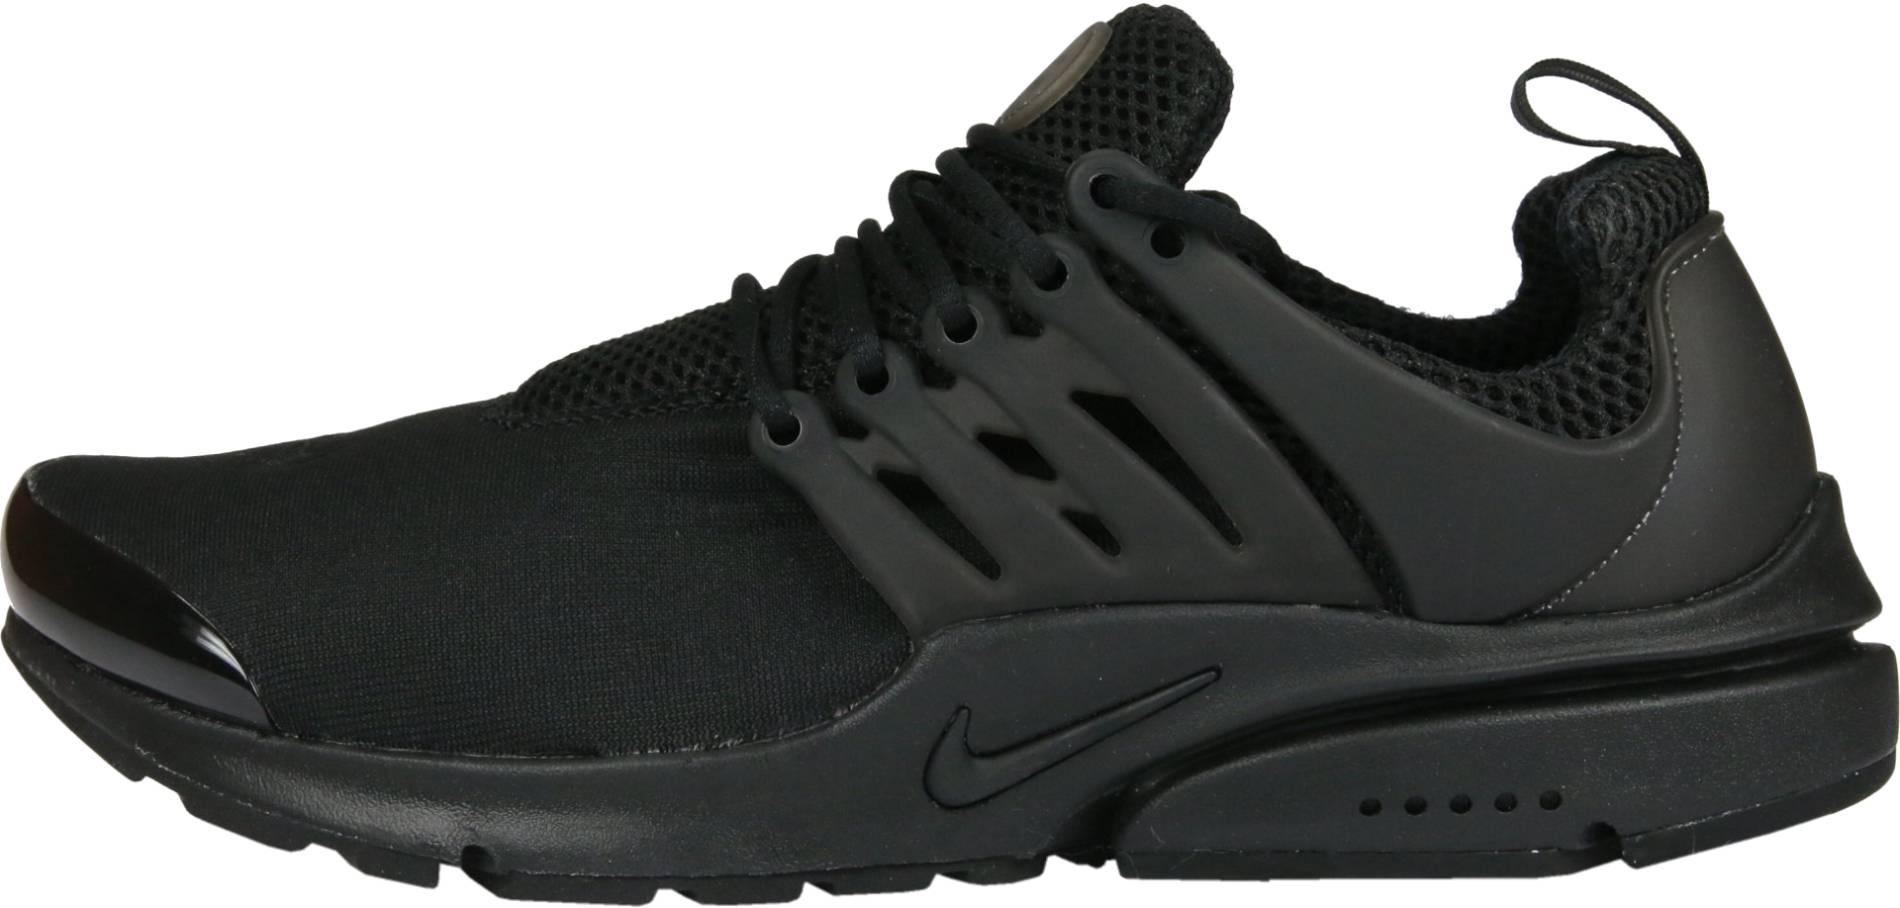 Jane Austen seco Comida sana  Nike Air Presto sneakers in black | RunRepeat